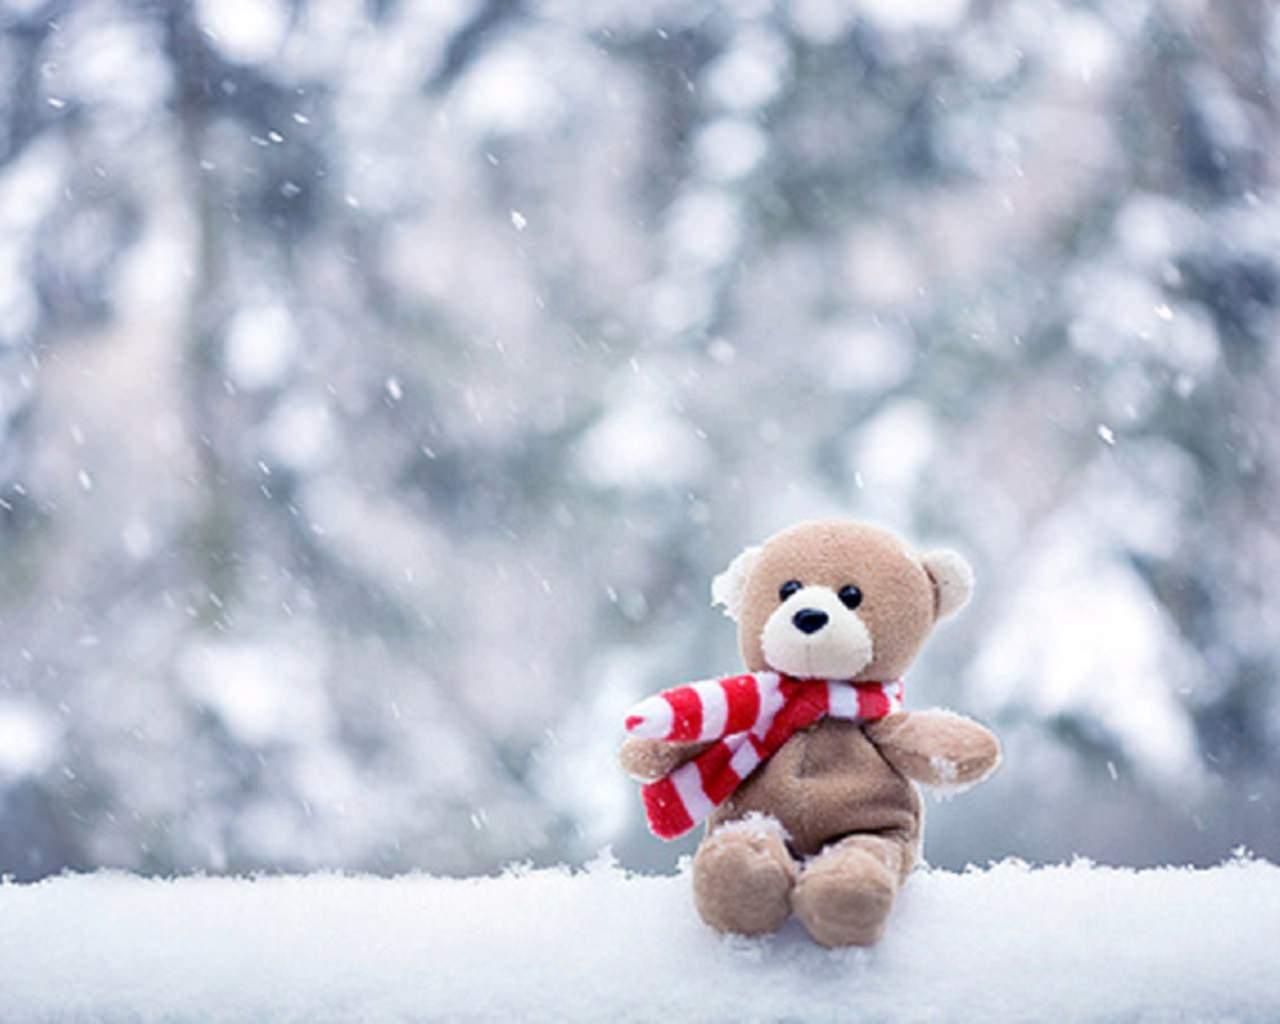 20 Cute Teddy Bear Wallpaper